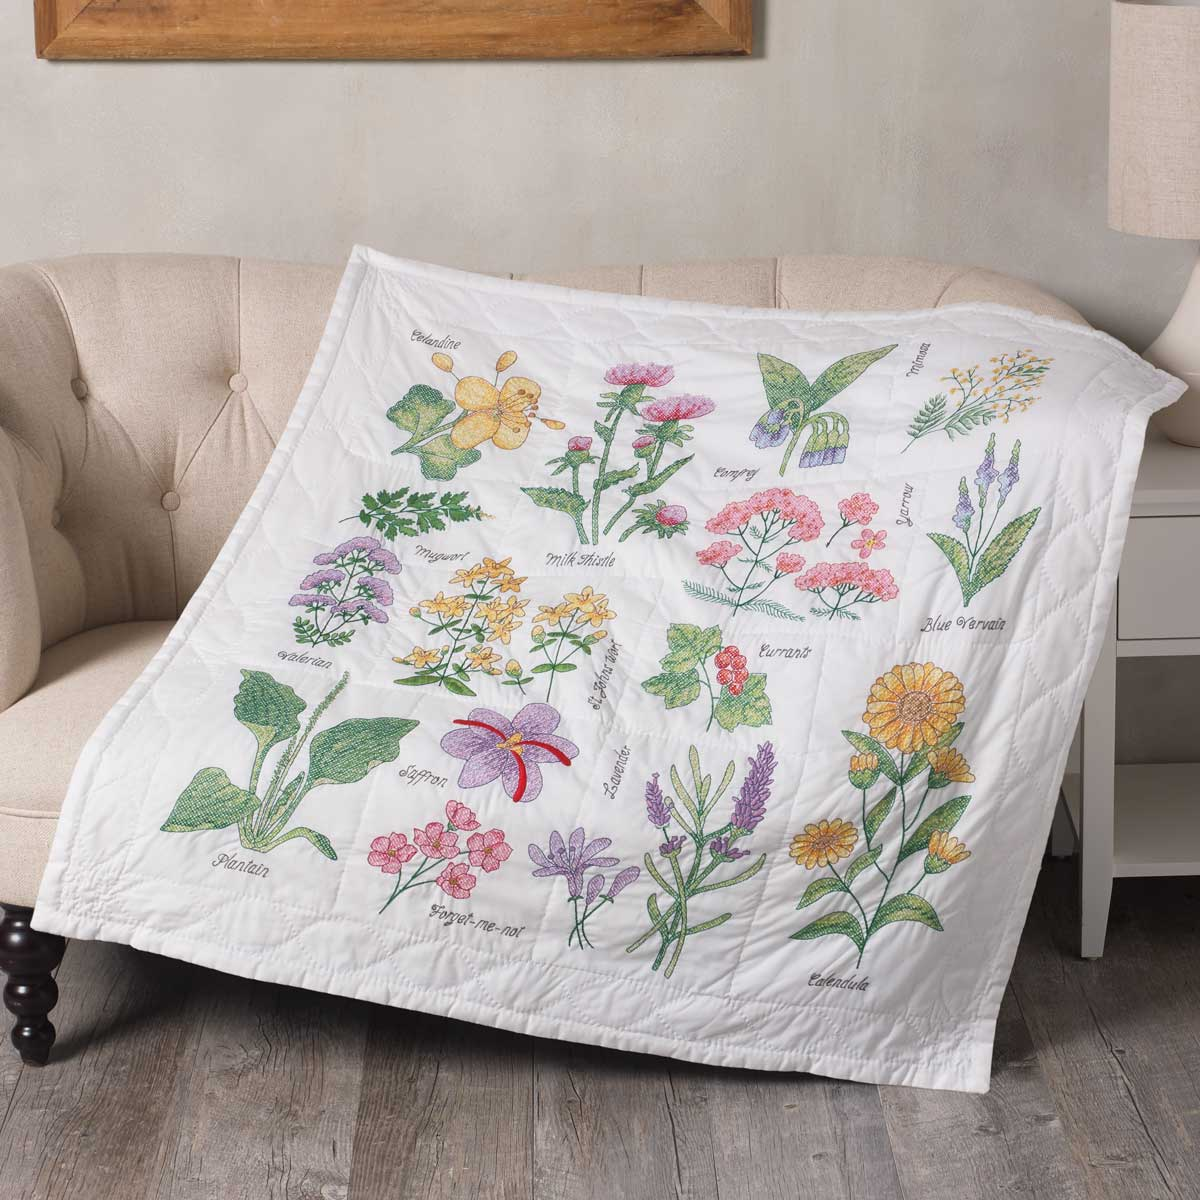 Bucilla ® Stamped Cross Stitch - Lap Quilts - Wildflower Botanical